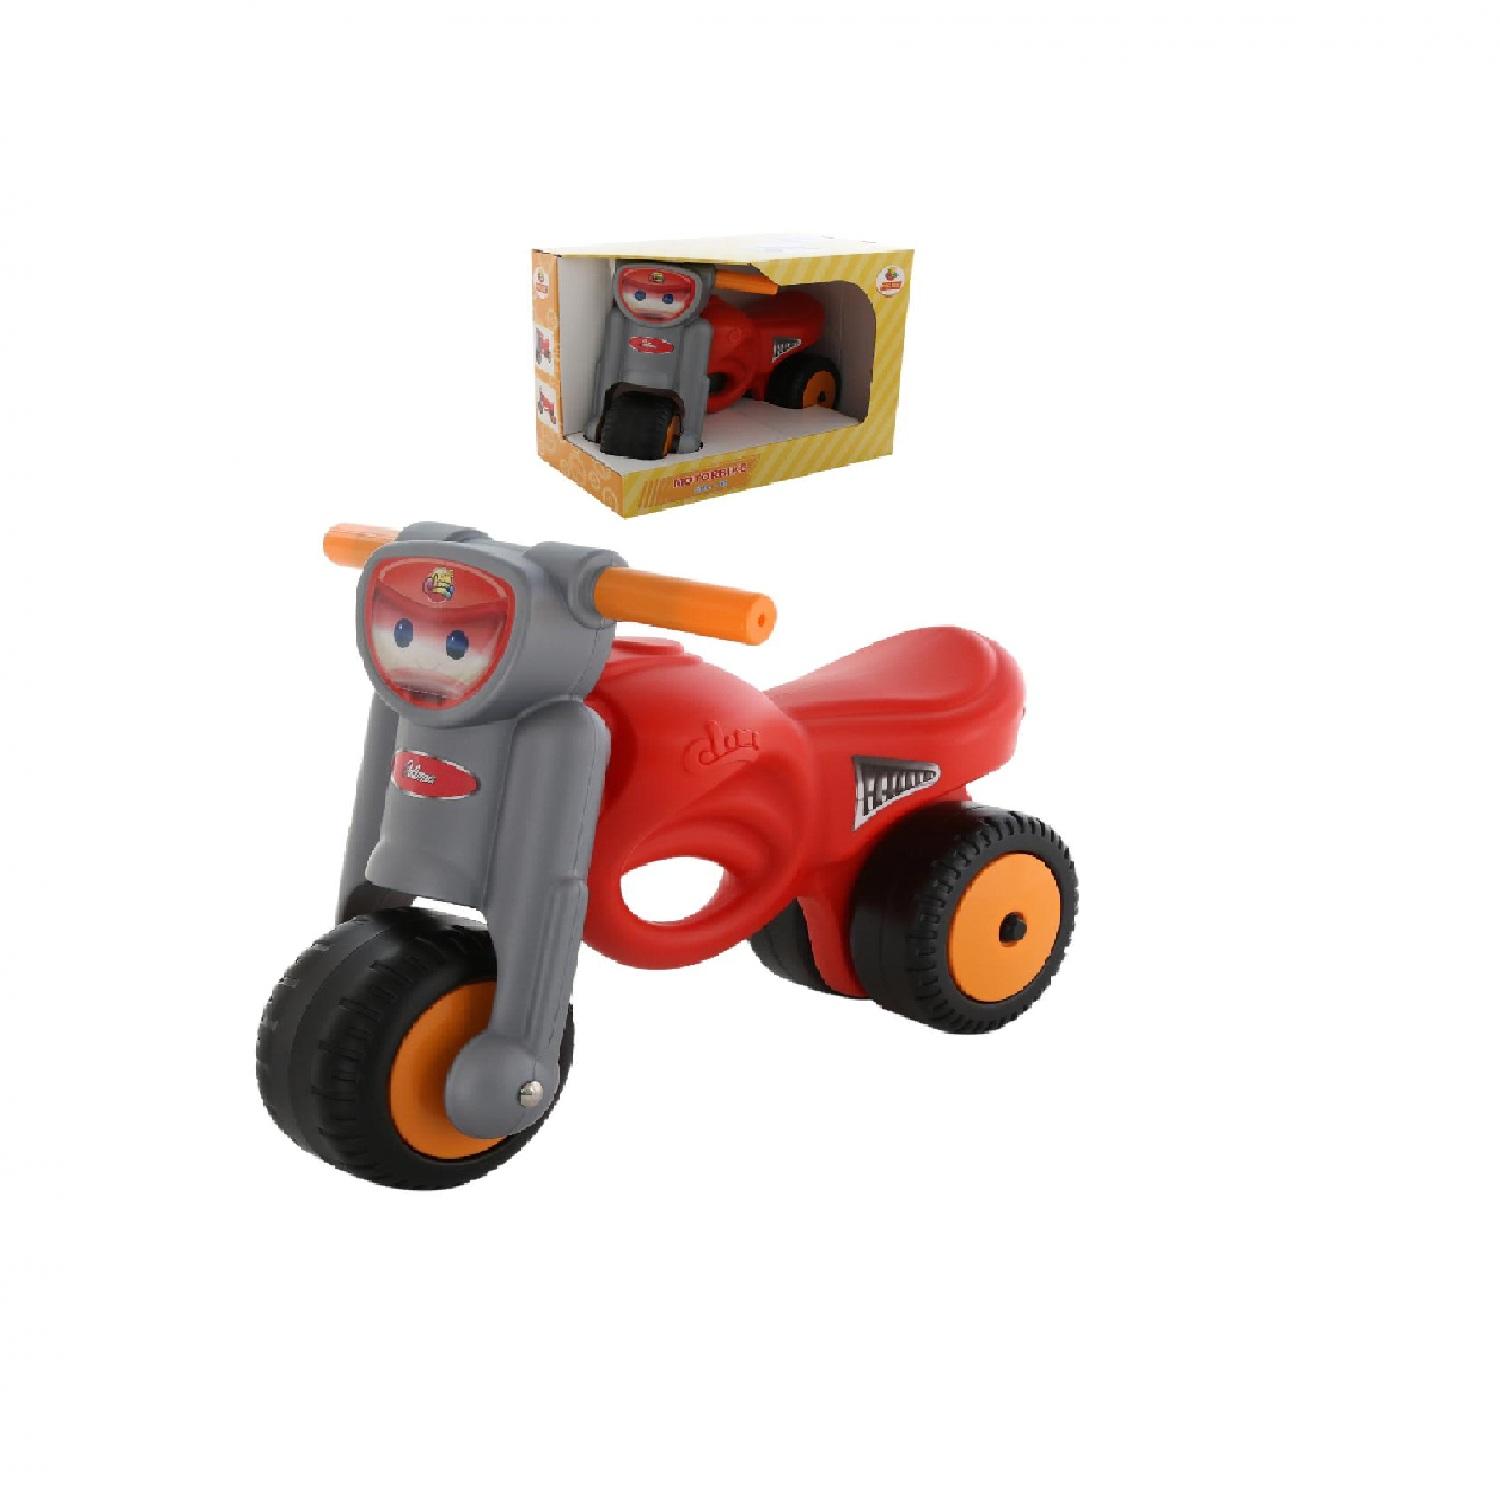 Каталка-мотоцикл Мини-мото в коробке Coloma Y Pastor 67166_PLS